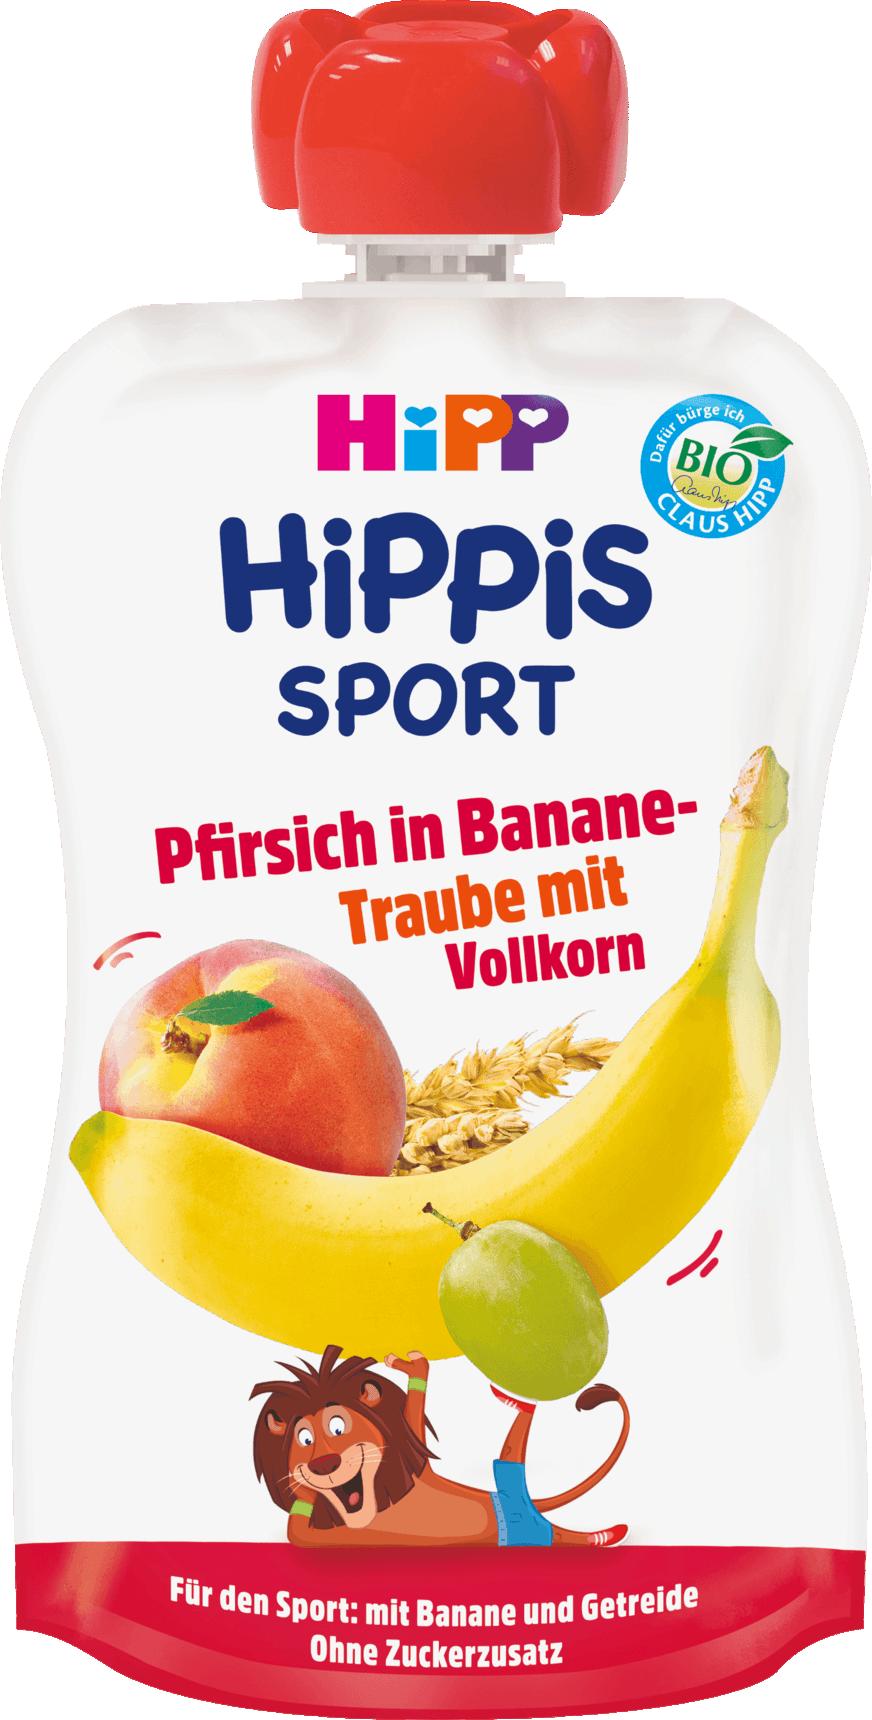 Hipp Hippies Sport Ροδάκινο, Μπανάνα, Σταφύλι & Δημητριακά Ολικής Άλεσης, 120gr